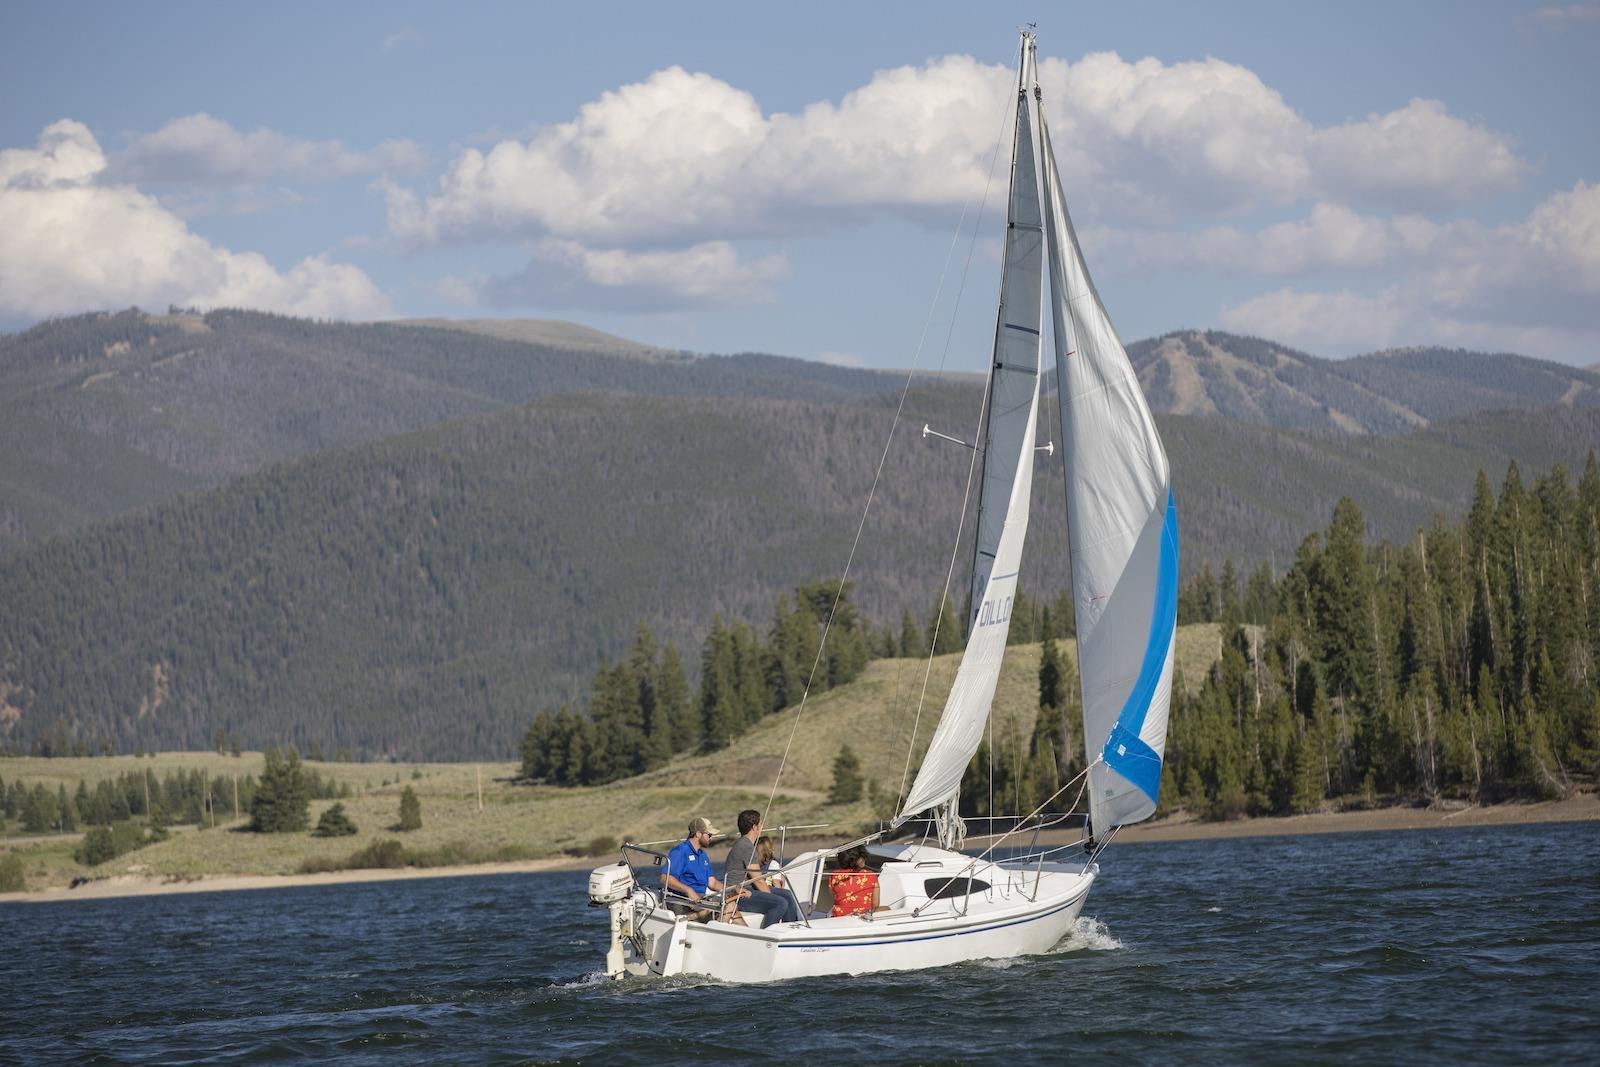 sailing on Lake Dillon, Colorado